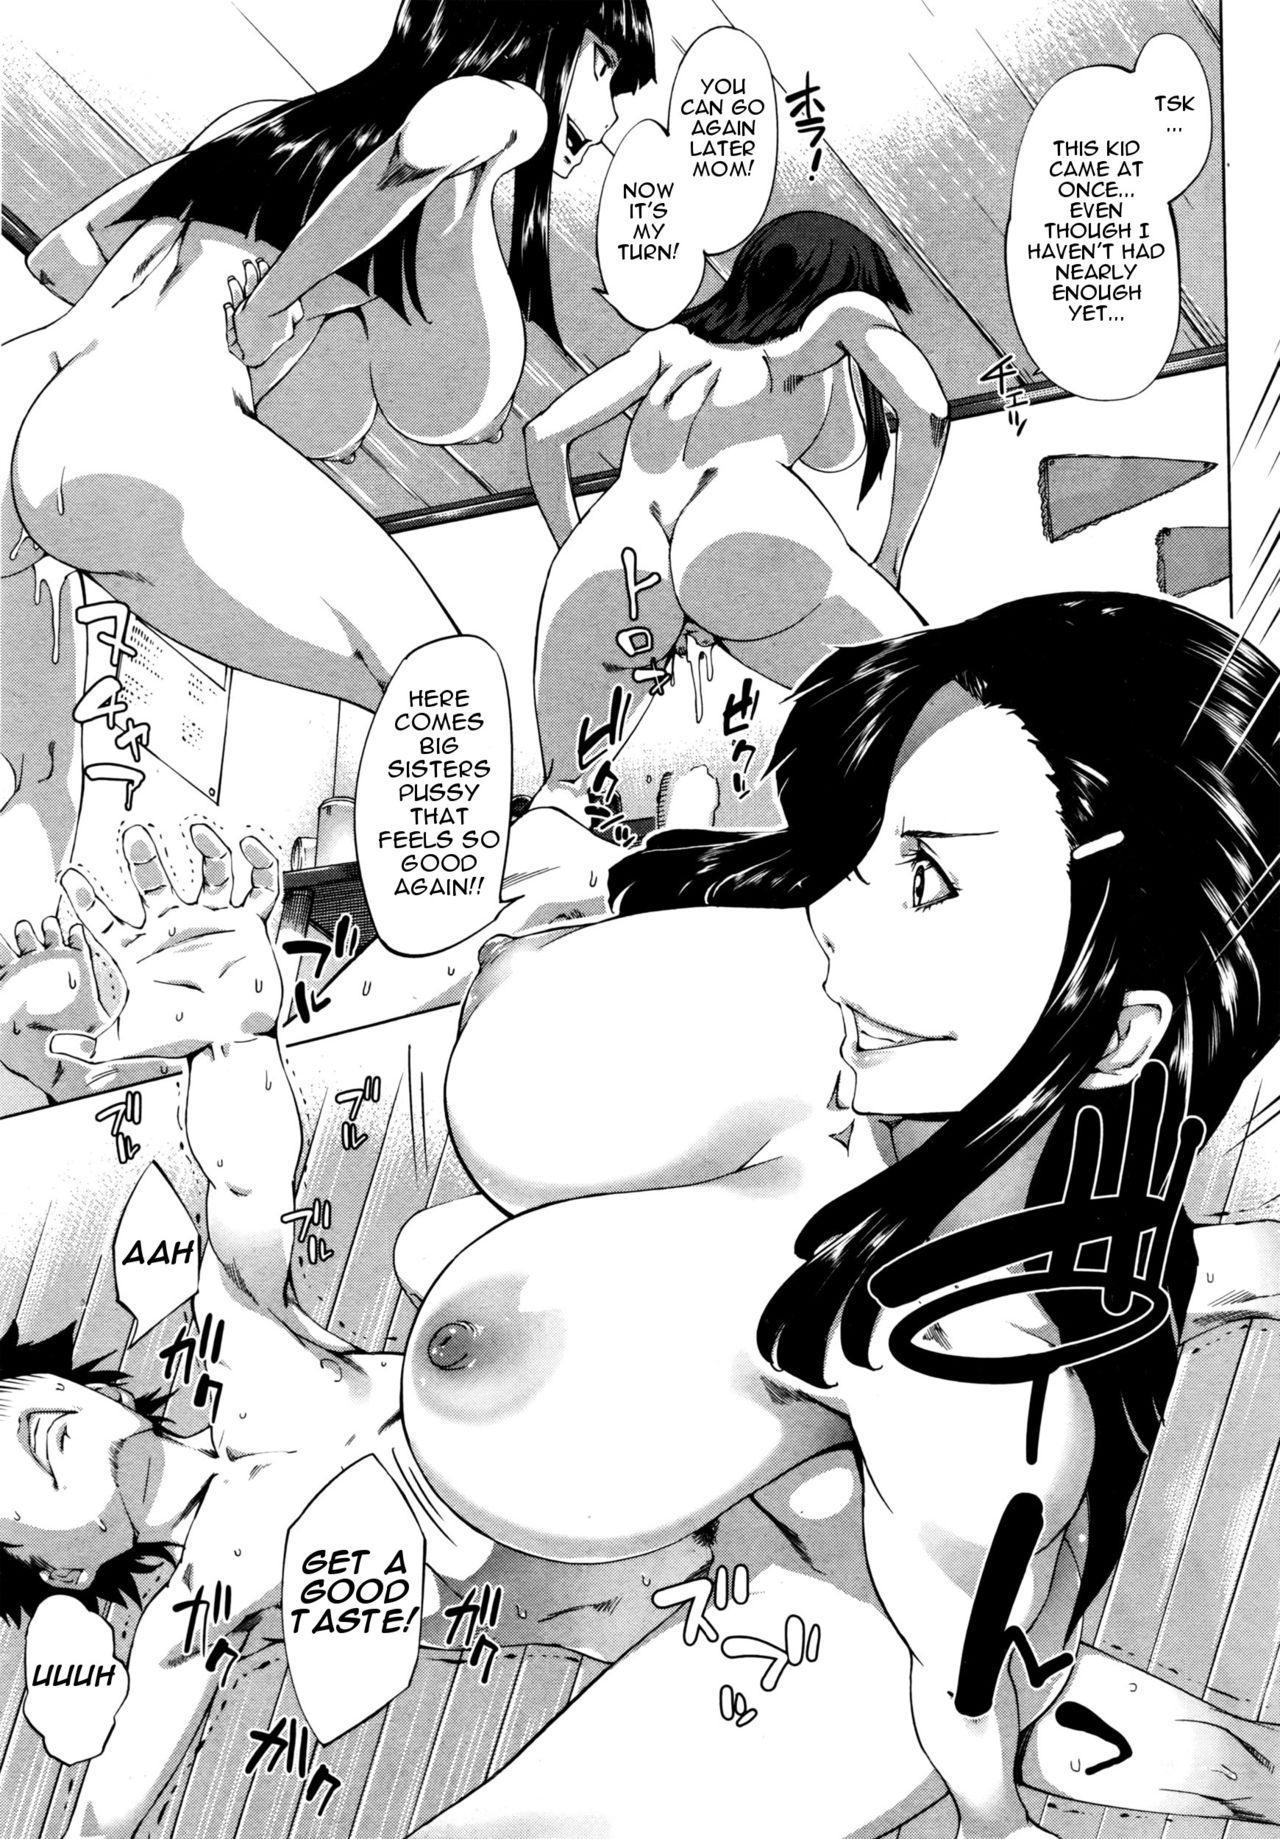 [Qdou Kei] Kaa-chan to Nee-chan ga Hidoin da yo | My mom and big sister are cruel (COMIC MILF 2016-08 Vol. 31) [English] [Januz] 28